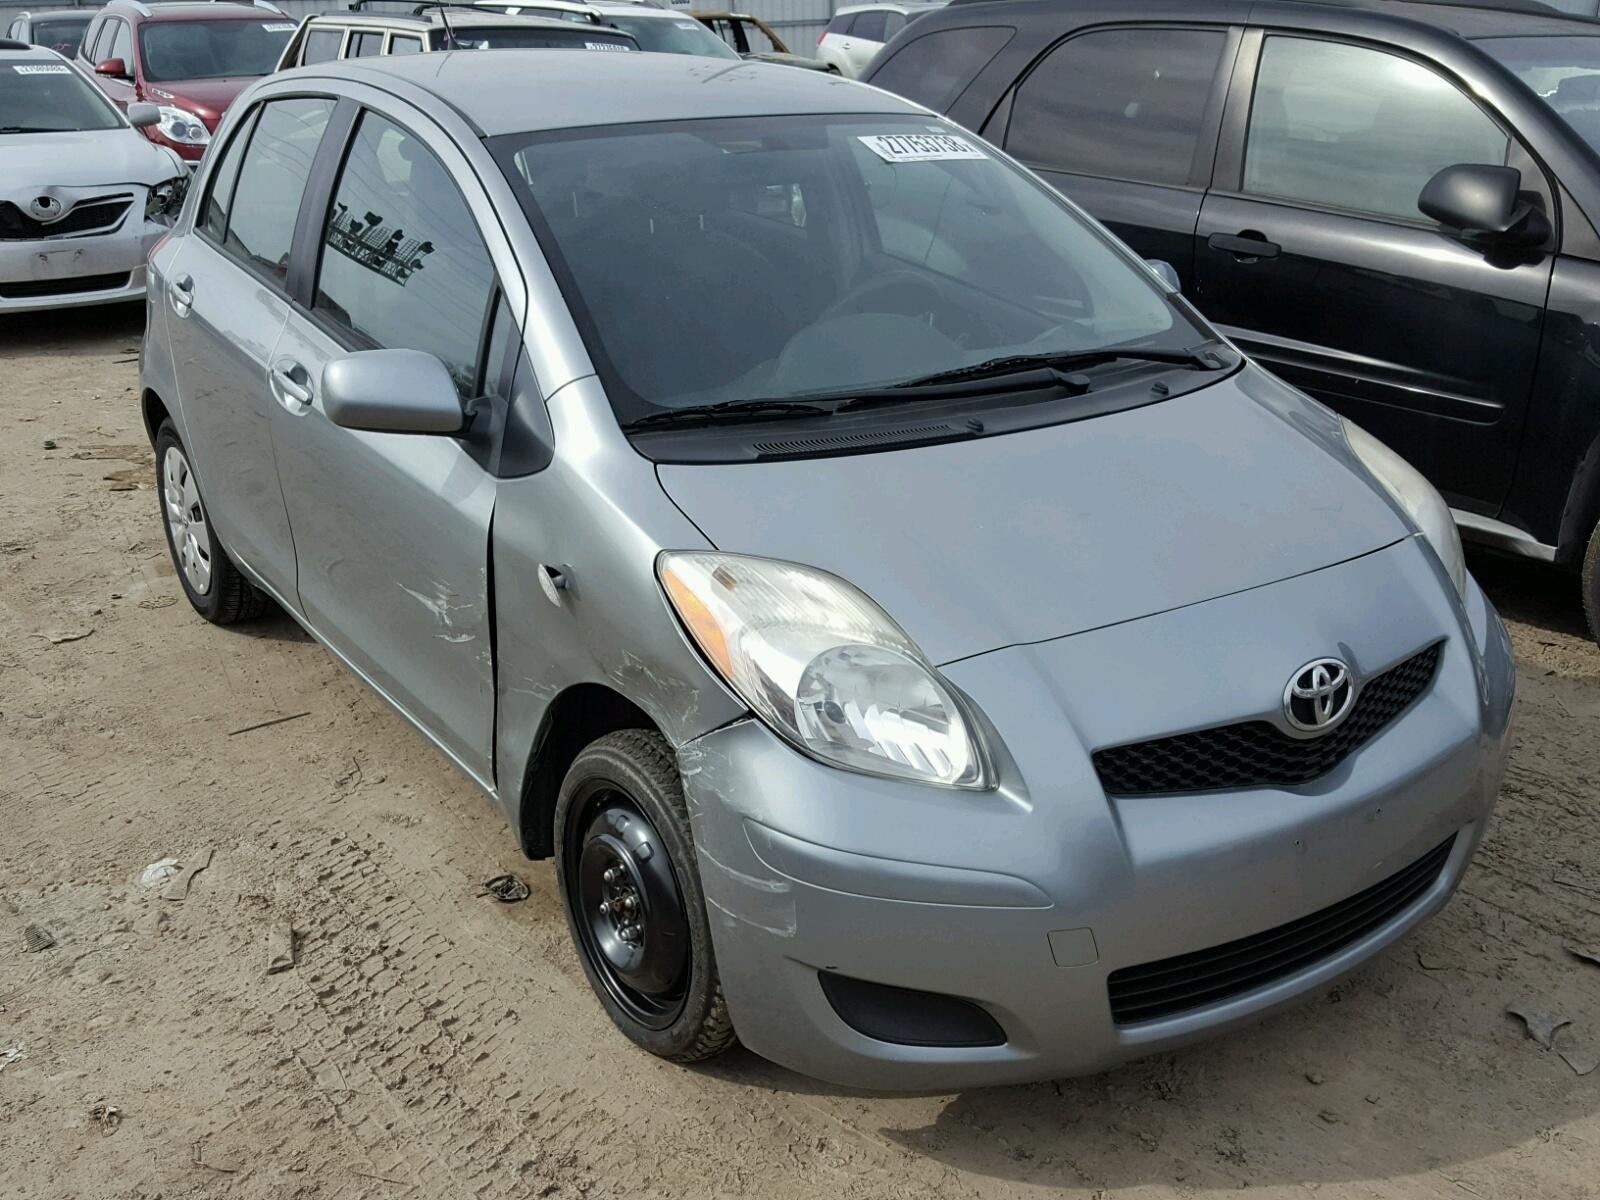 Auto Auction Ended On Vin 2t1burhe2ec045181 2014 Toyota